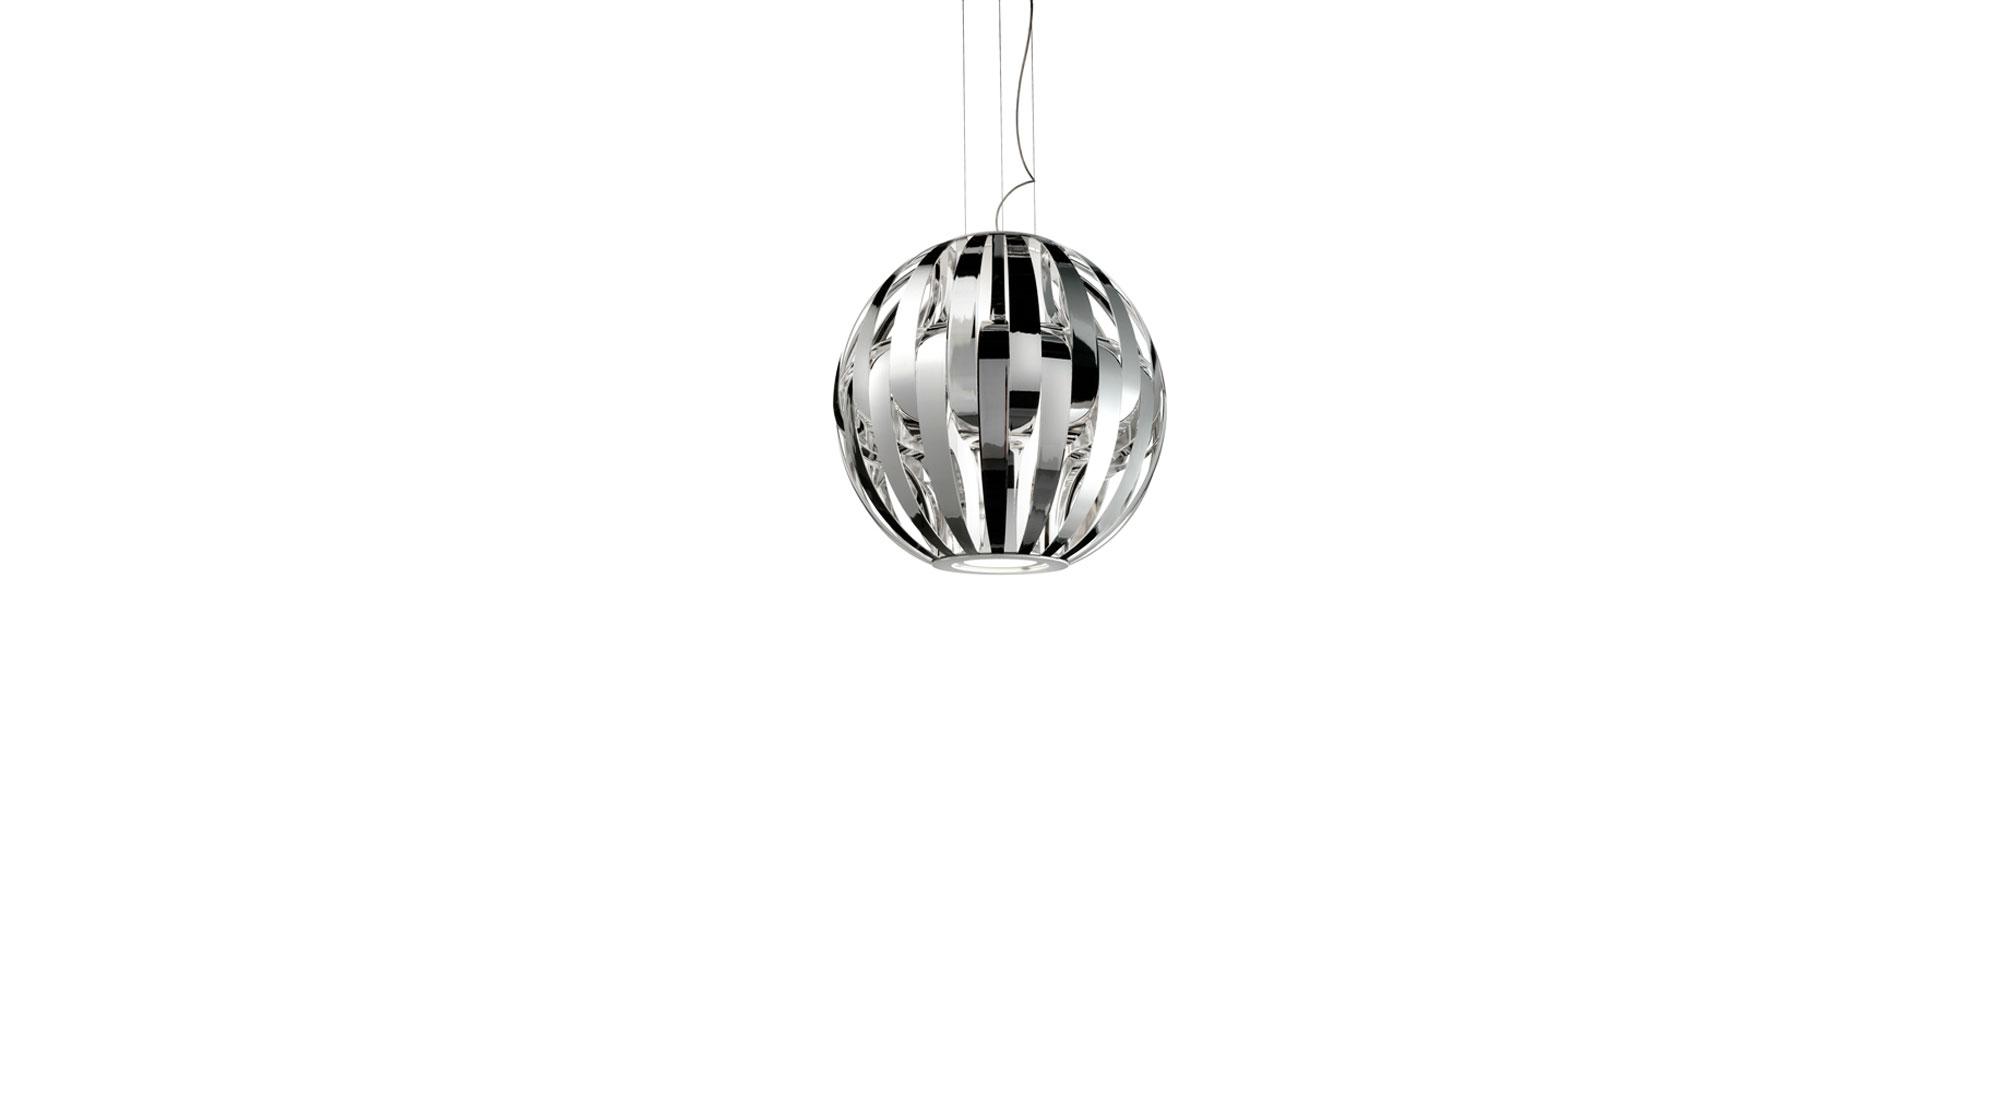 sfera argento1 2